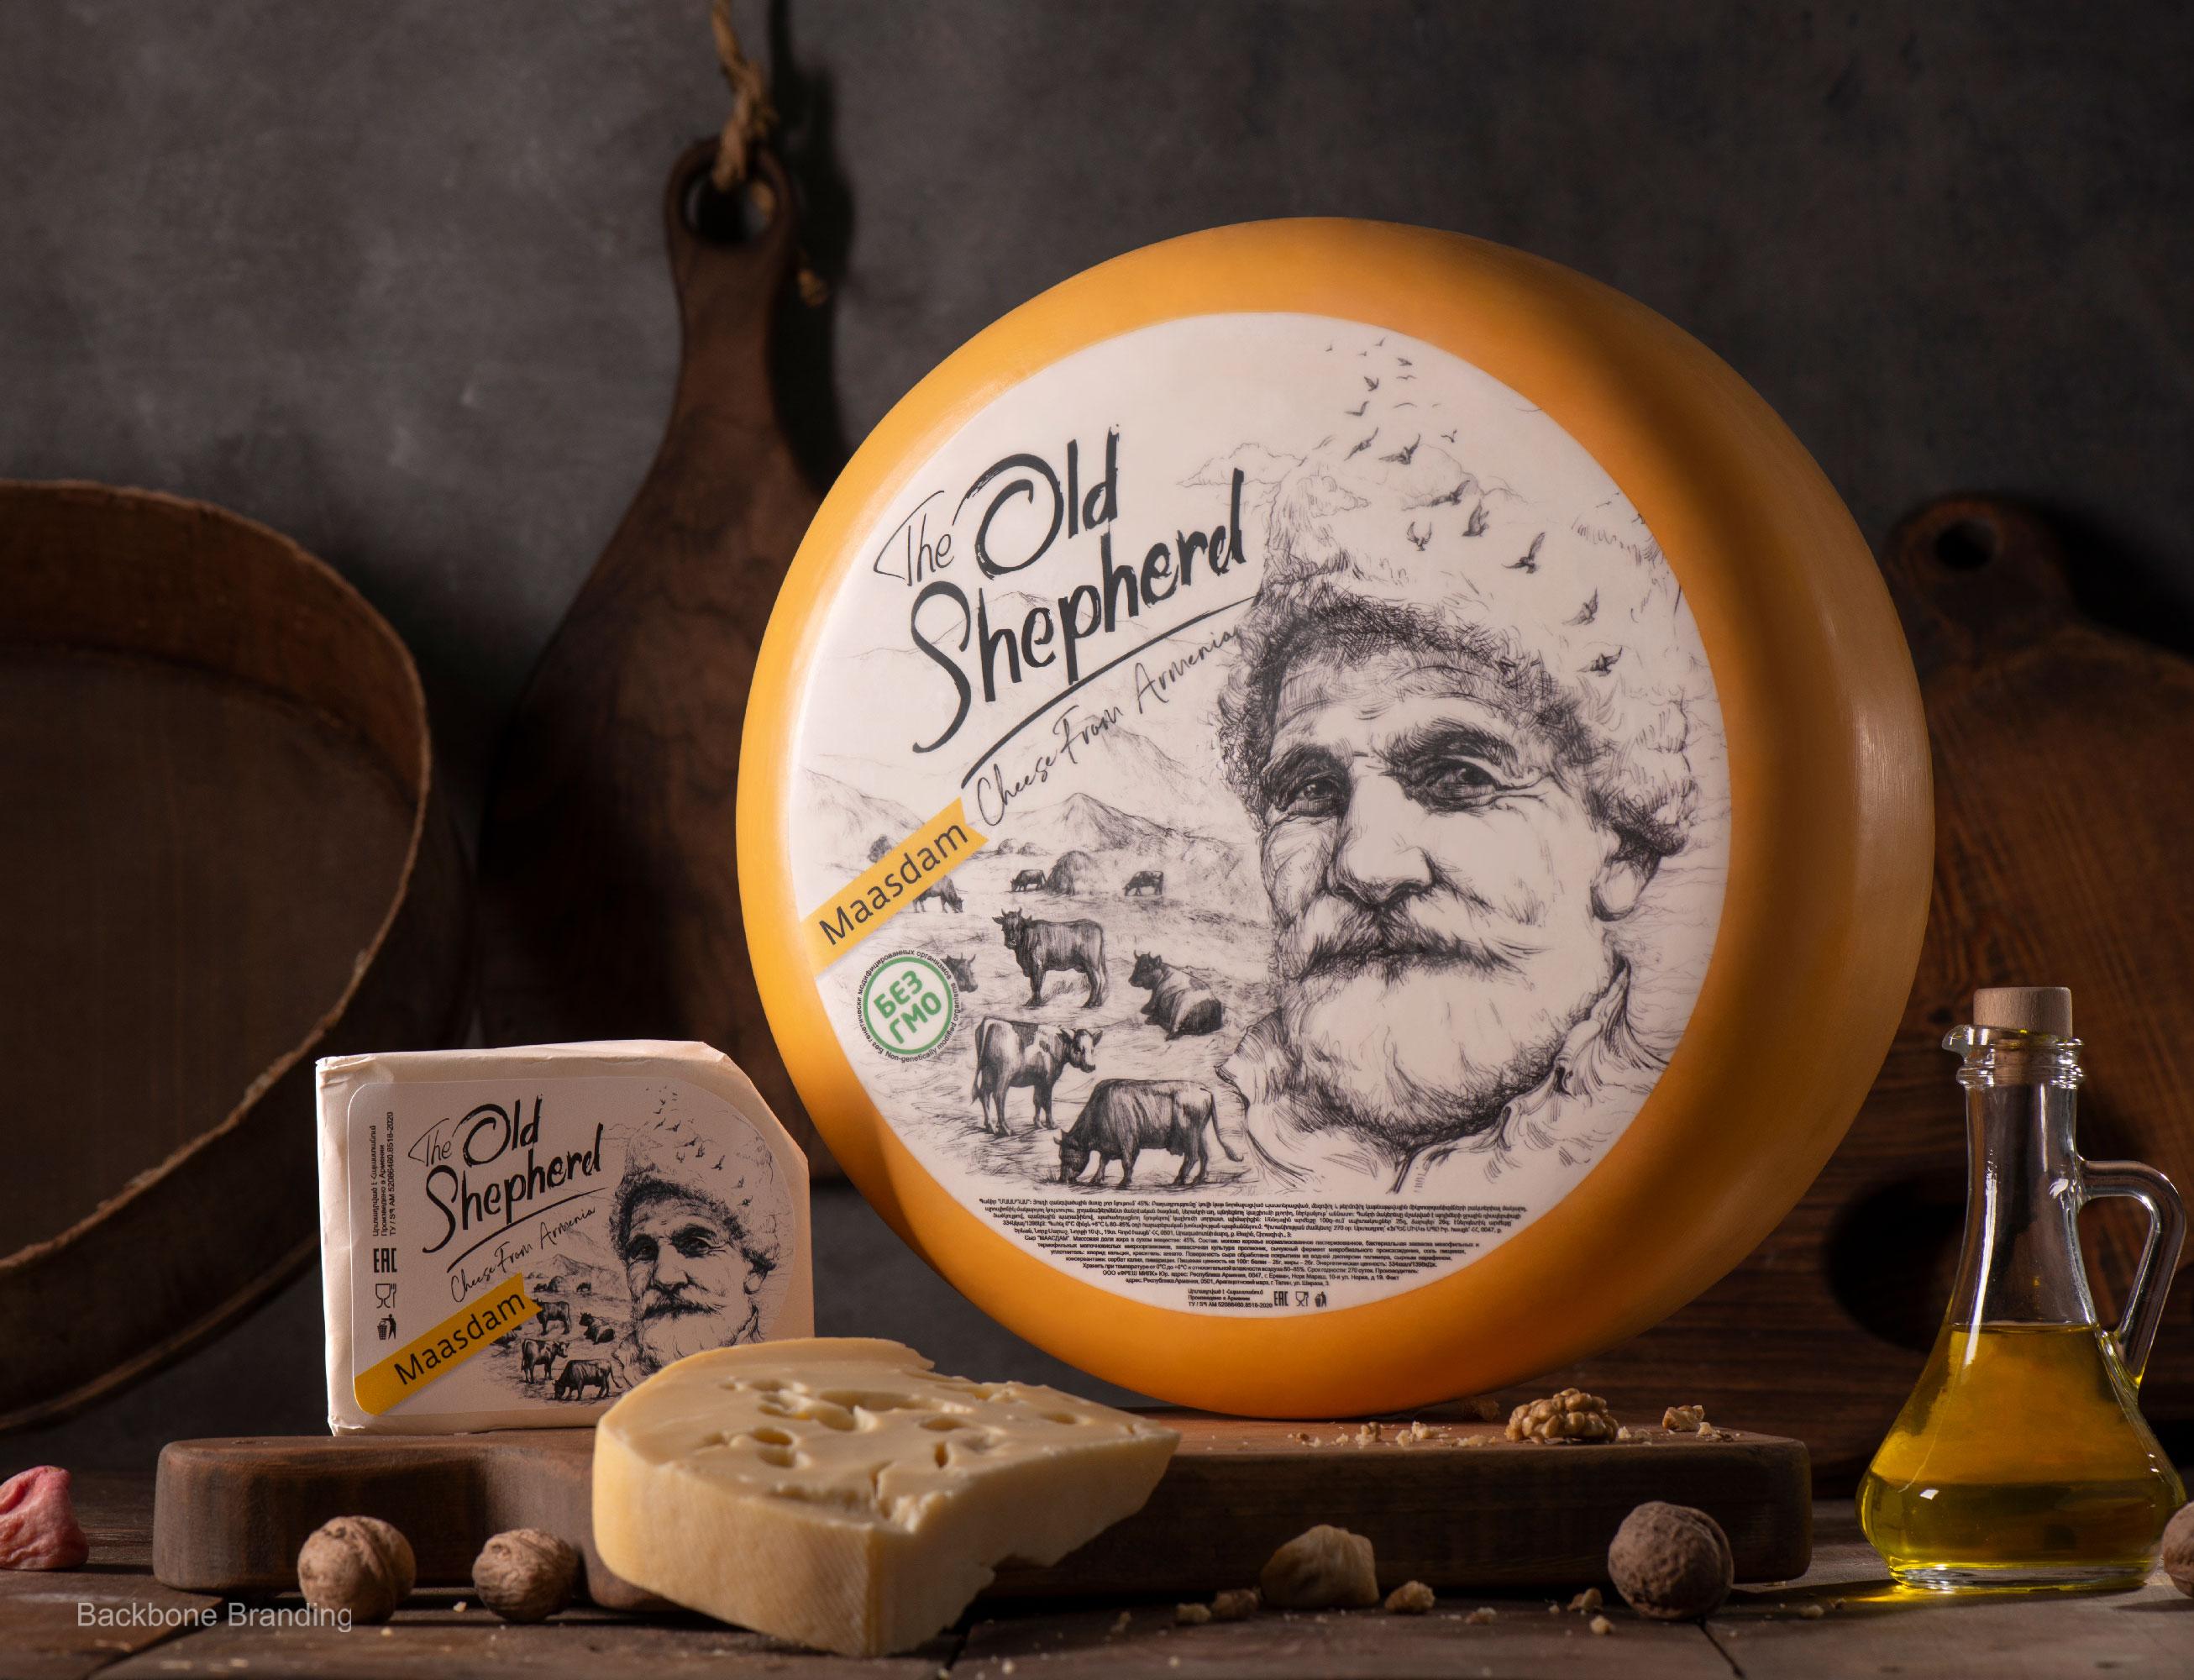 Backbone Branding Create Packaging Design for a New Brand of Masdaam Cheese